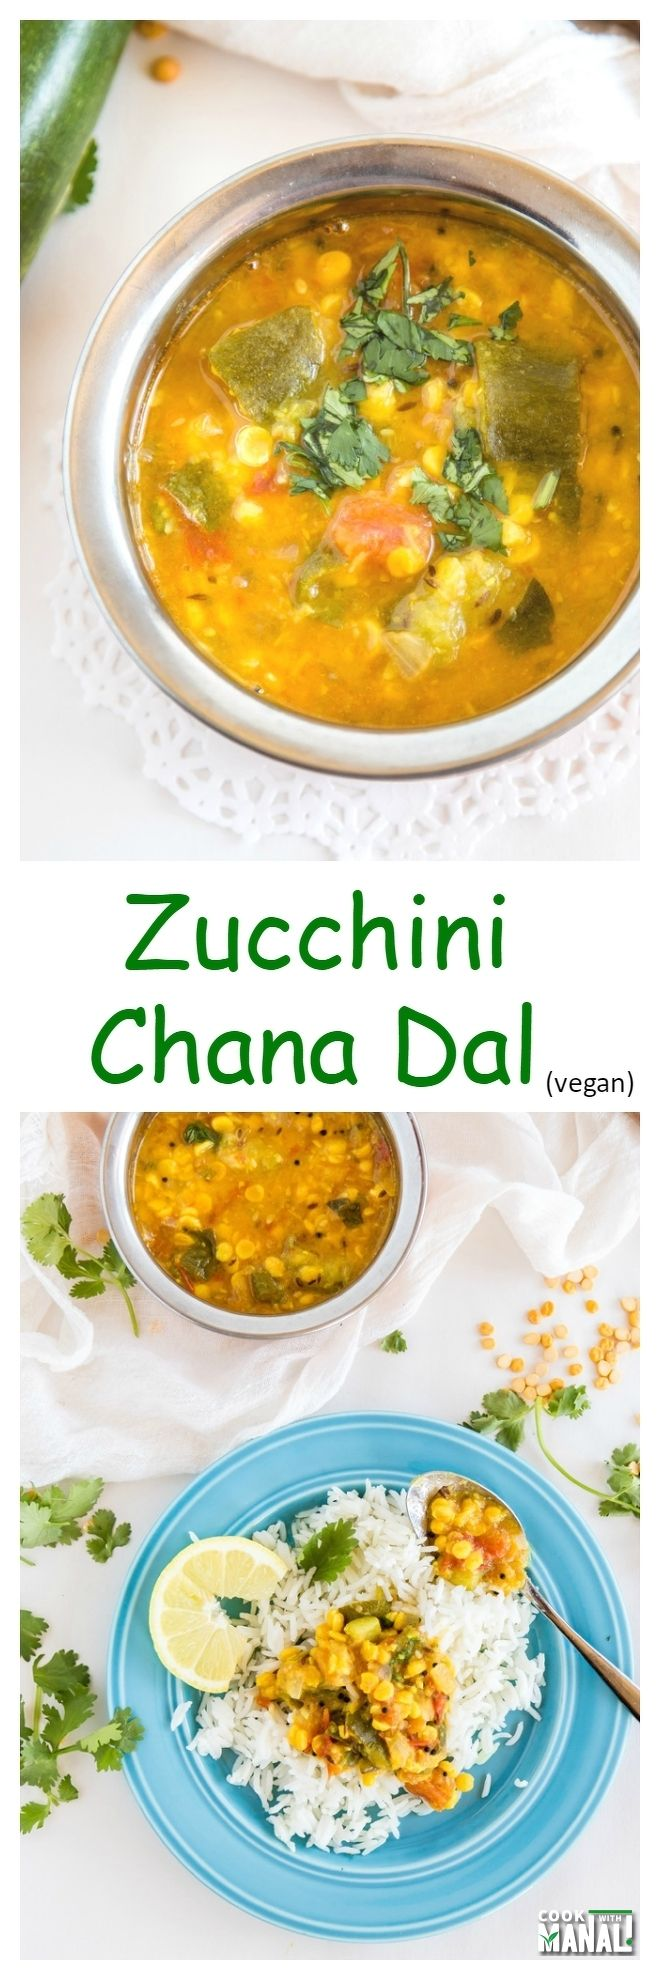 Zucchini Chana Dal Collage